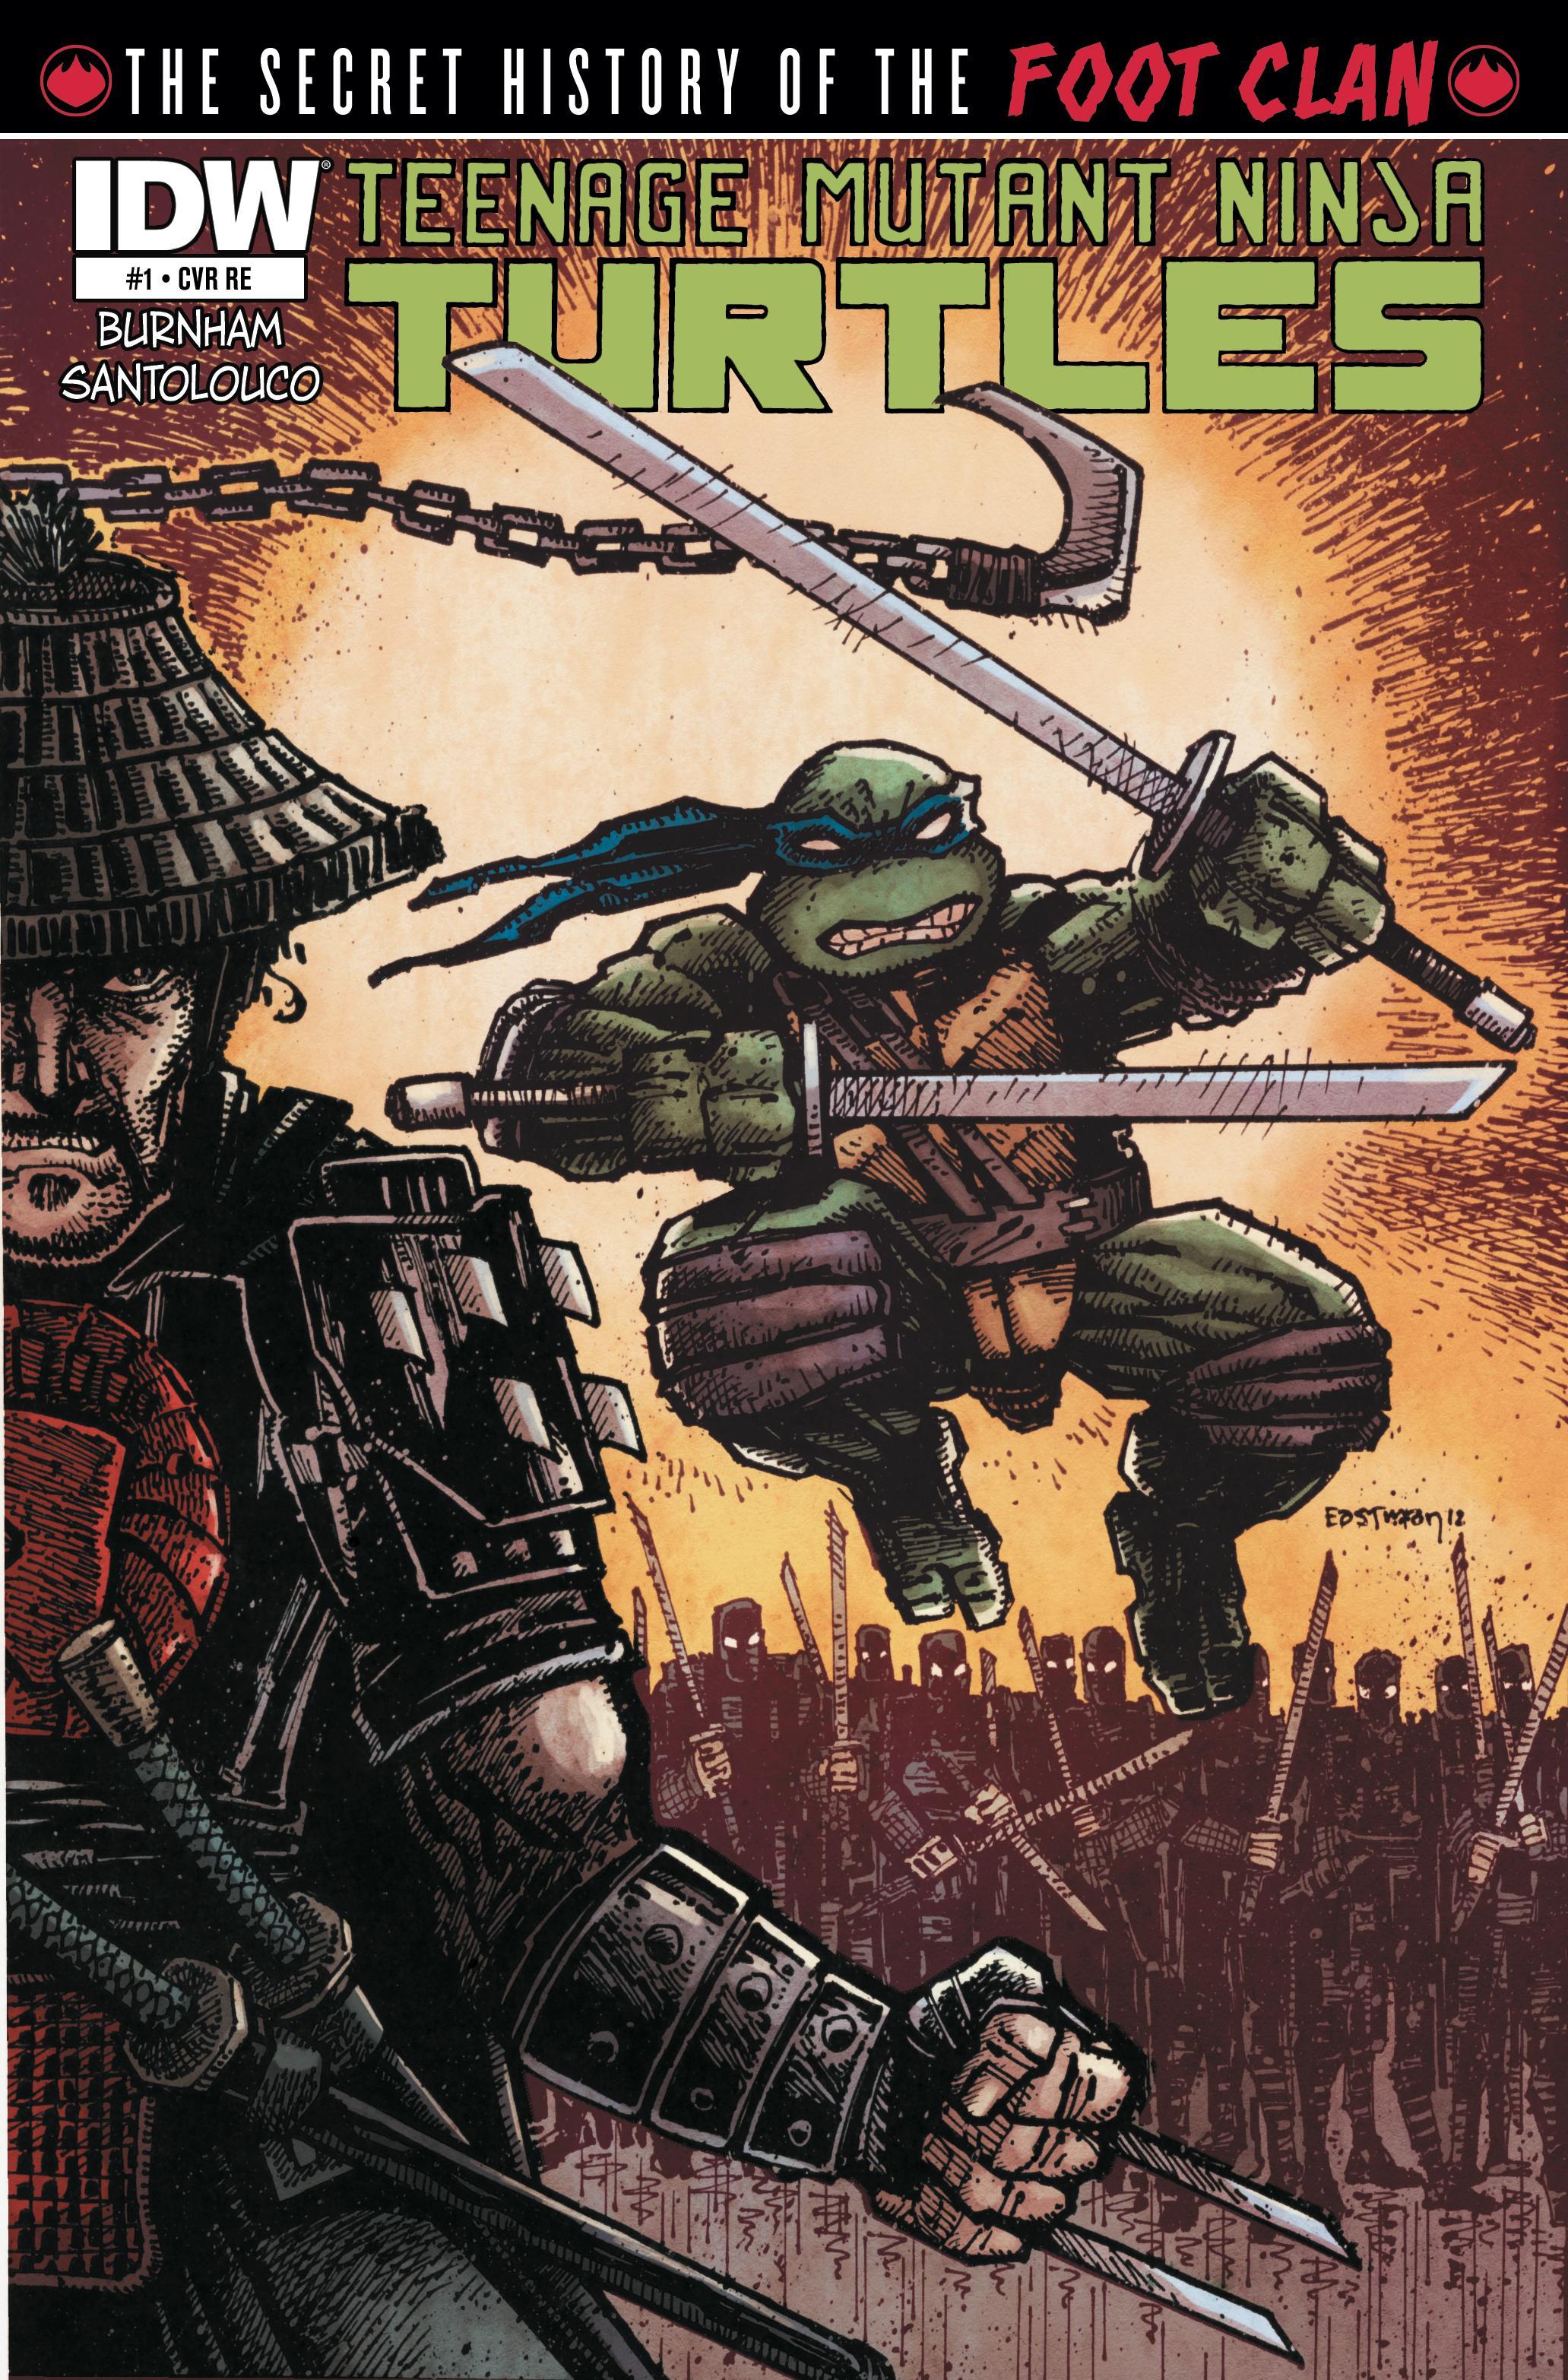 Exclusive Kevin Eastman's Art for Jetpack Comics (1)